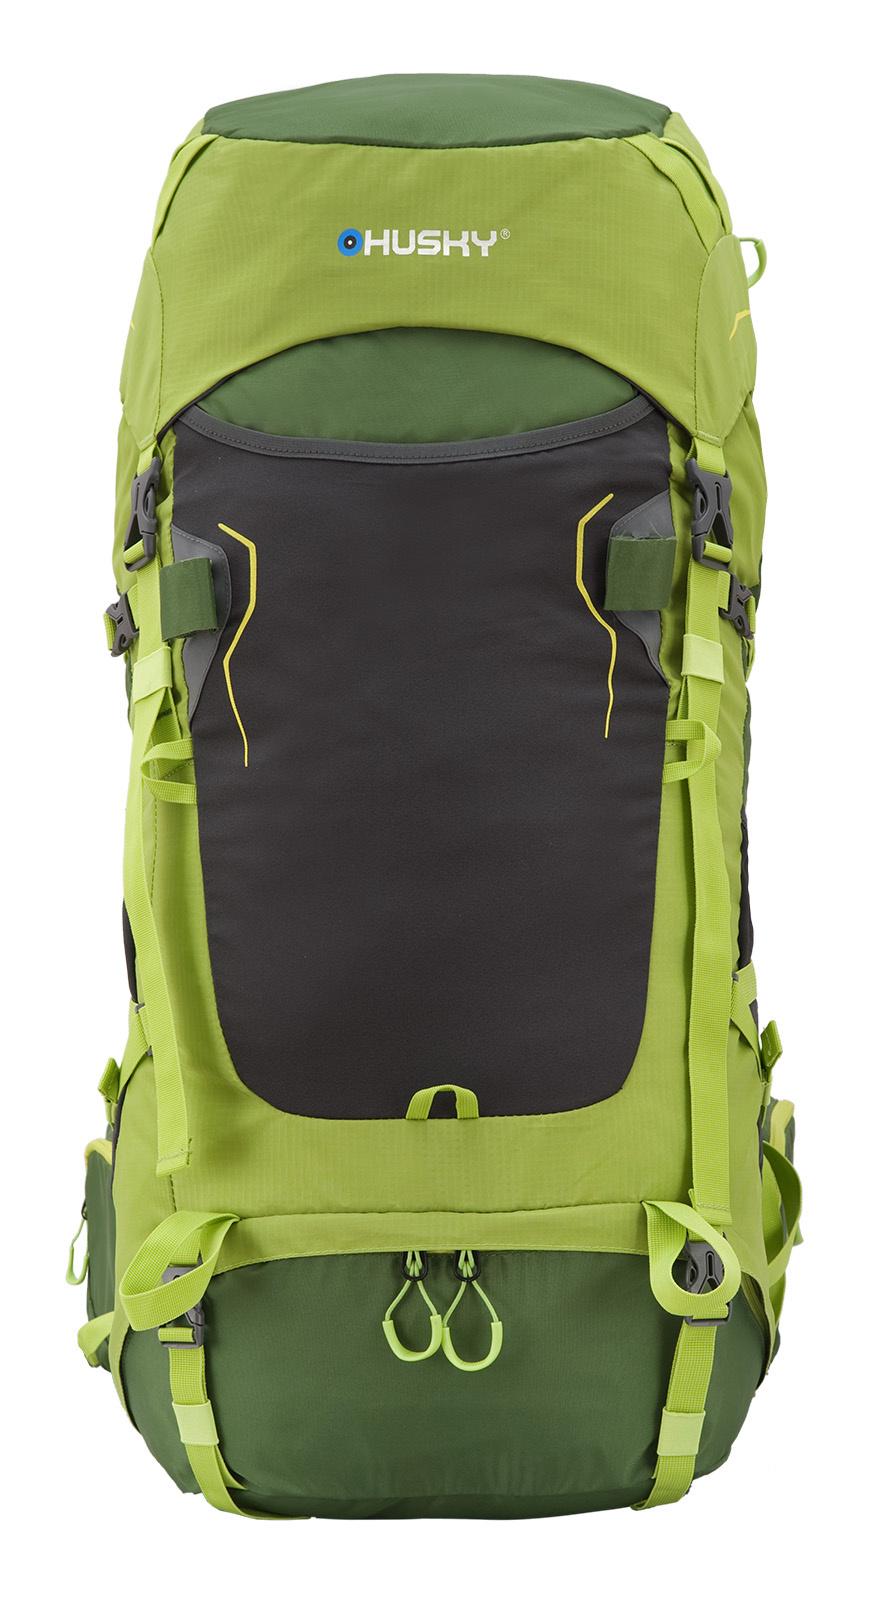 b62b0907ea Plastenka deluxe s kapsou na batoh zelena levně